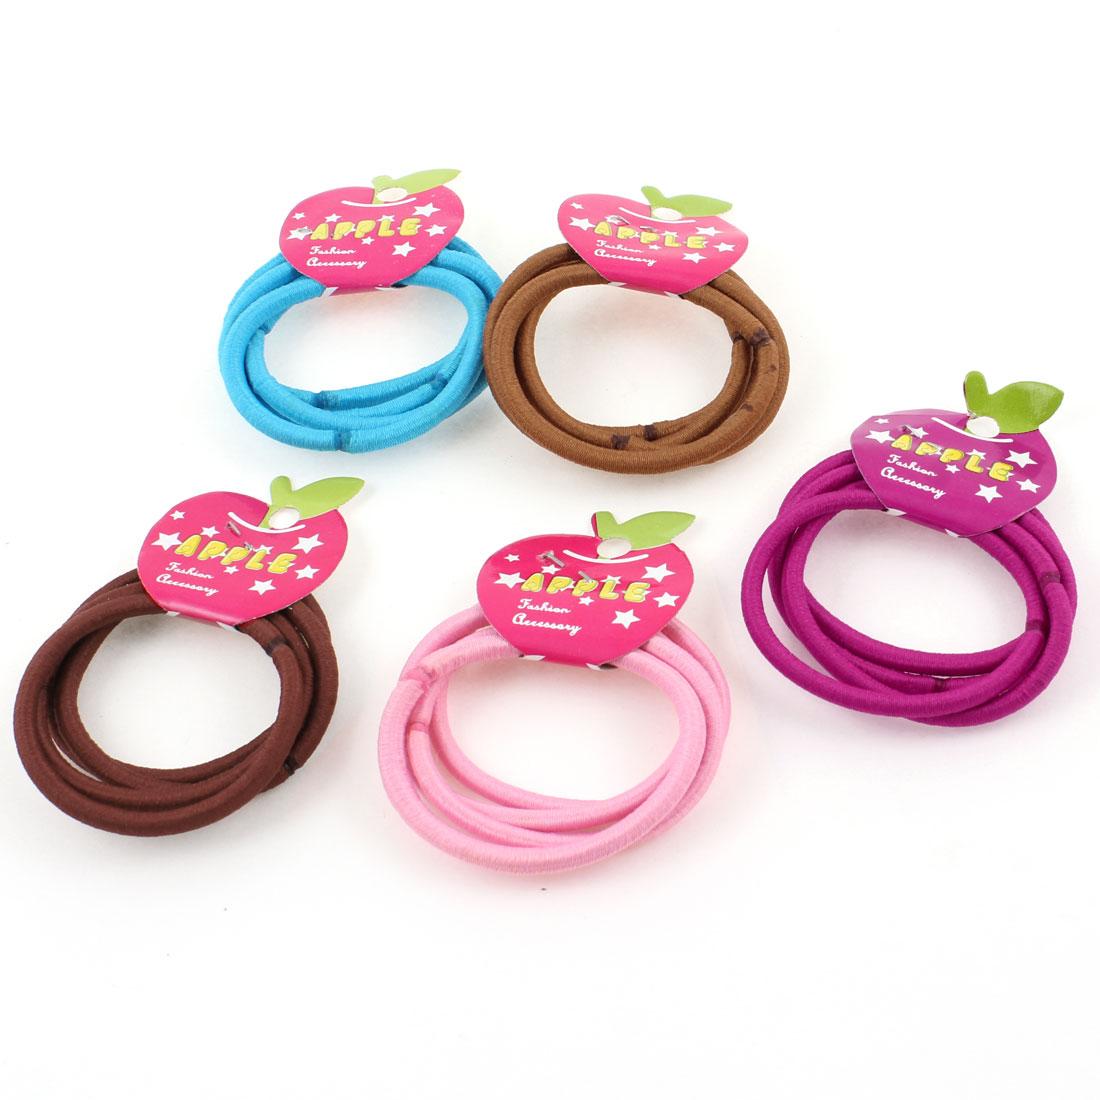 Lady Women Nylon Wrapped Elastic Rubber Ponytail Holder Bands Colorful 20 Pcs